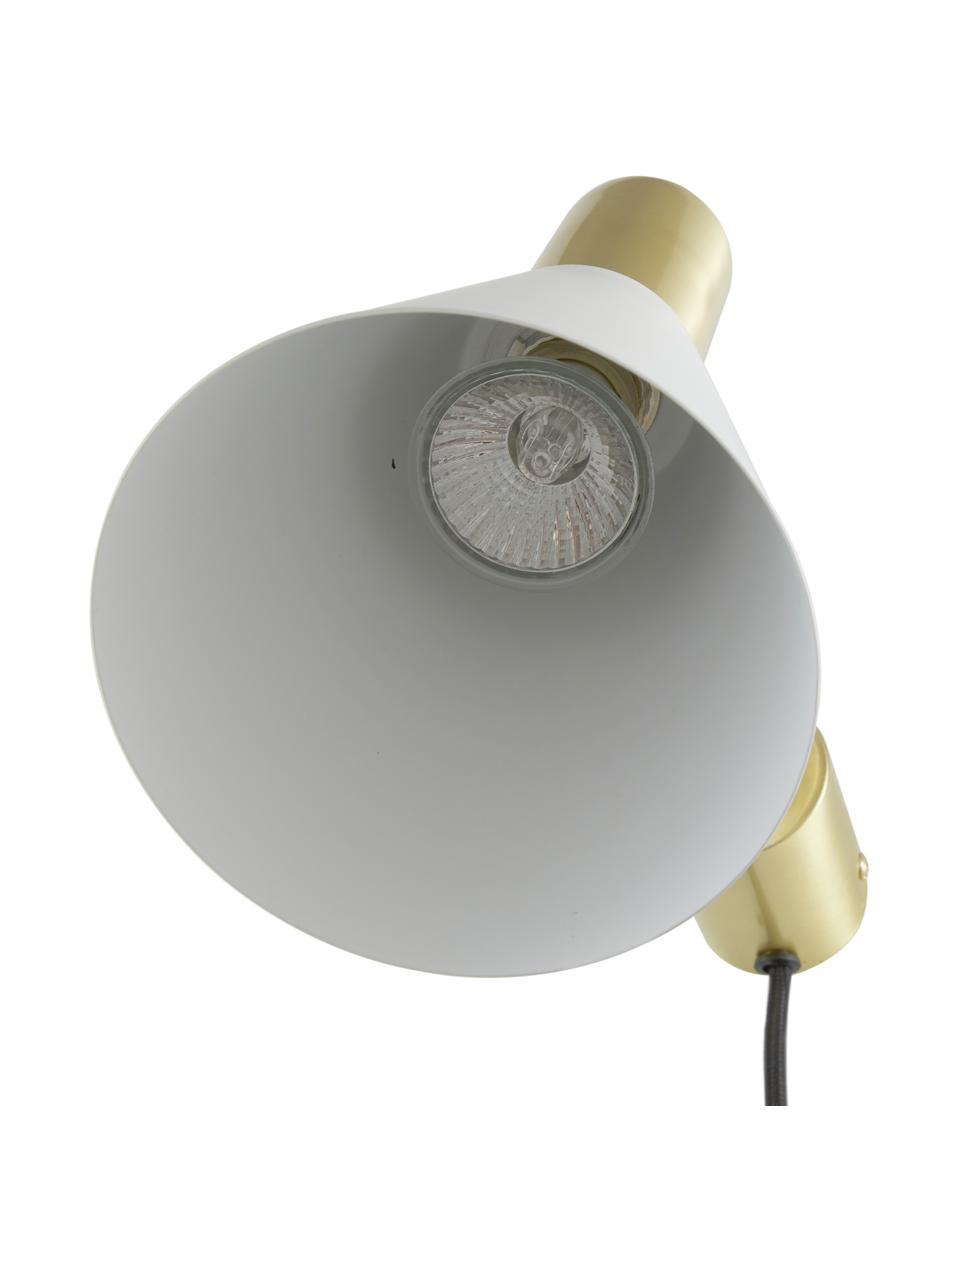 Applique con spina Sia, Paralume: Metallo verniciato a polv, Bianco ottonato, Ø 13 x Alt. 27 cm